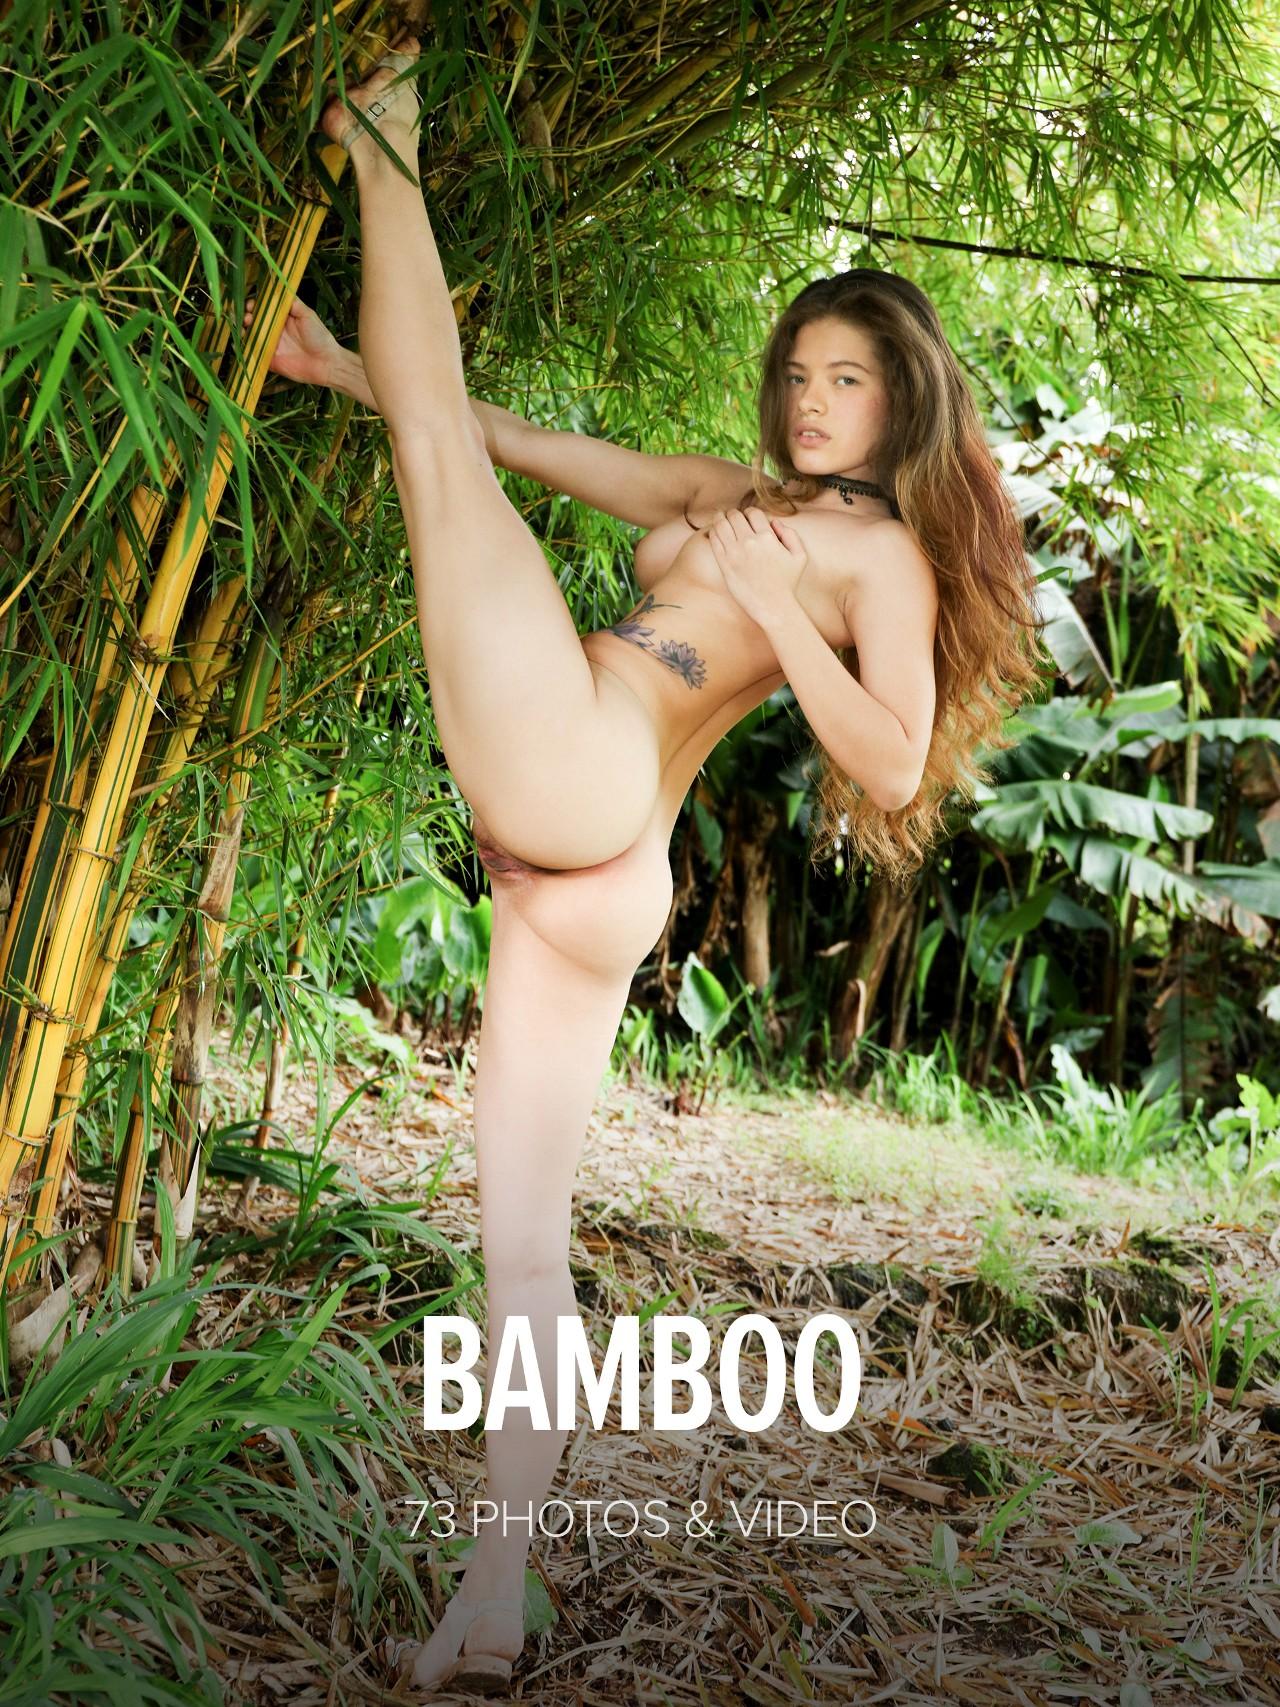 Irene Rouse: Bamboo